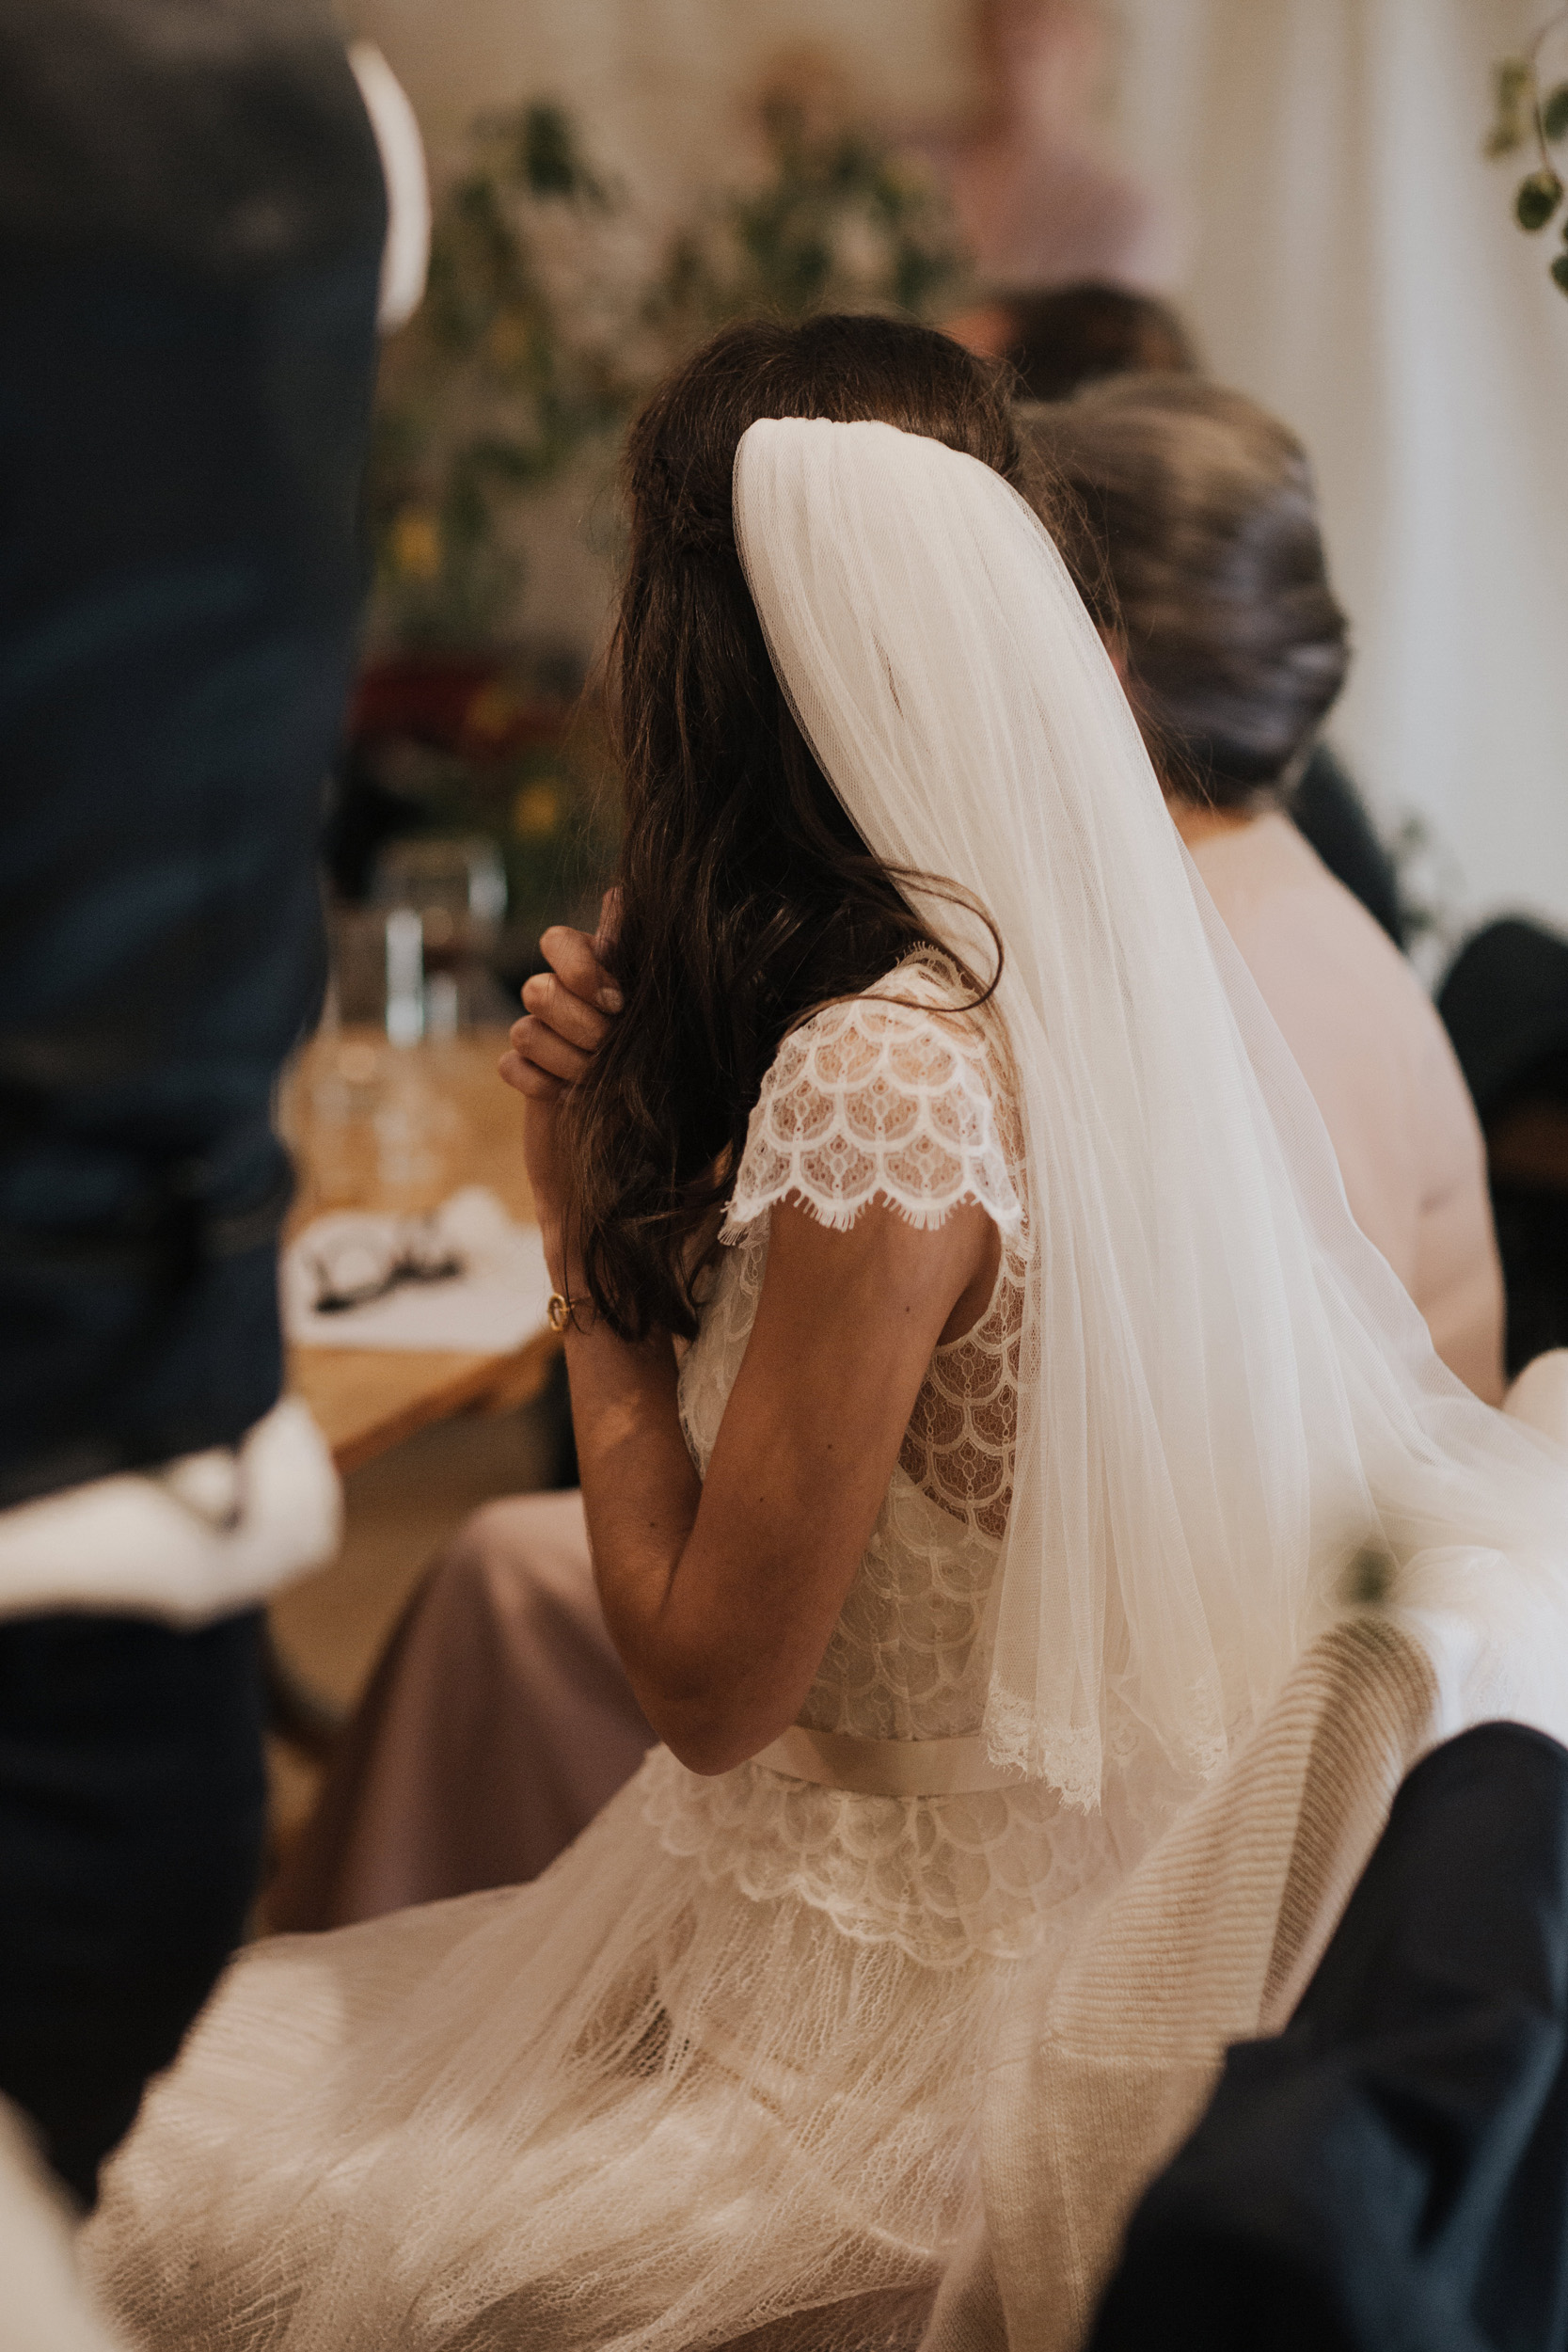 Joasia-Kate-Beaumont-Bohemian-Lace-Wedding-Dress-Peak-District-Sheffield-Wedding-56.jpg